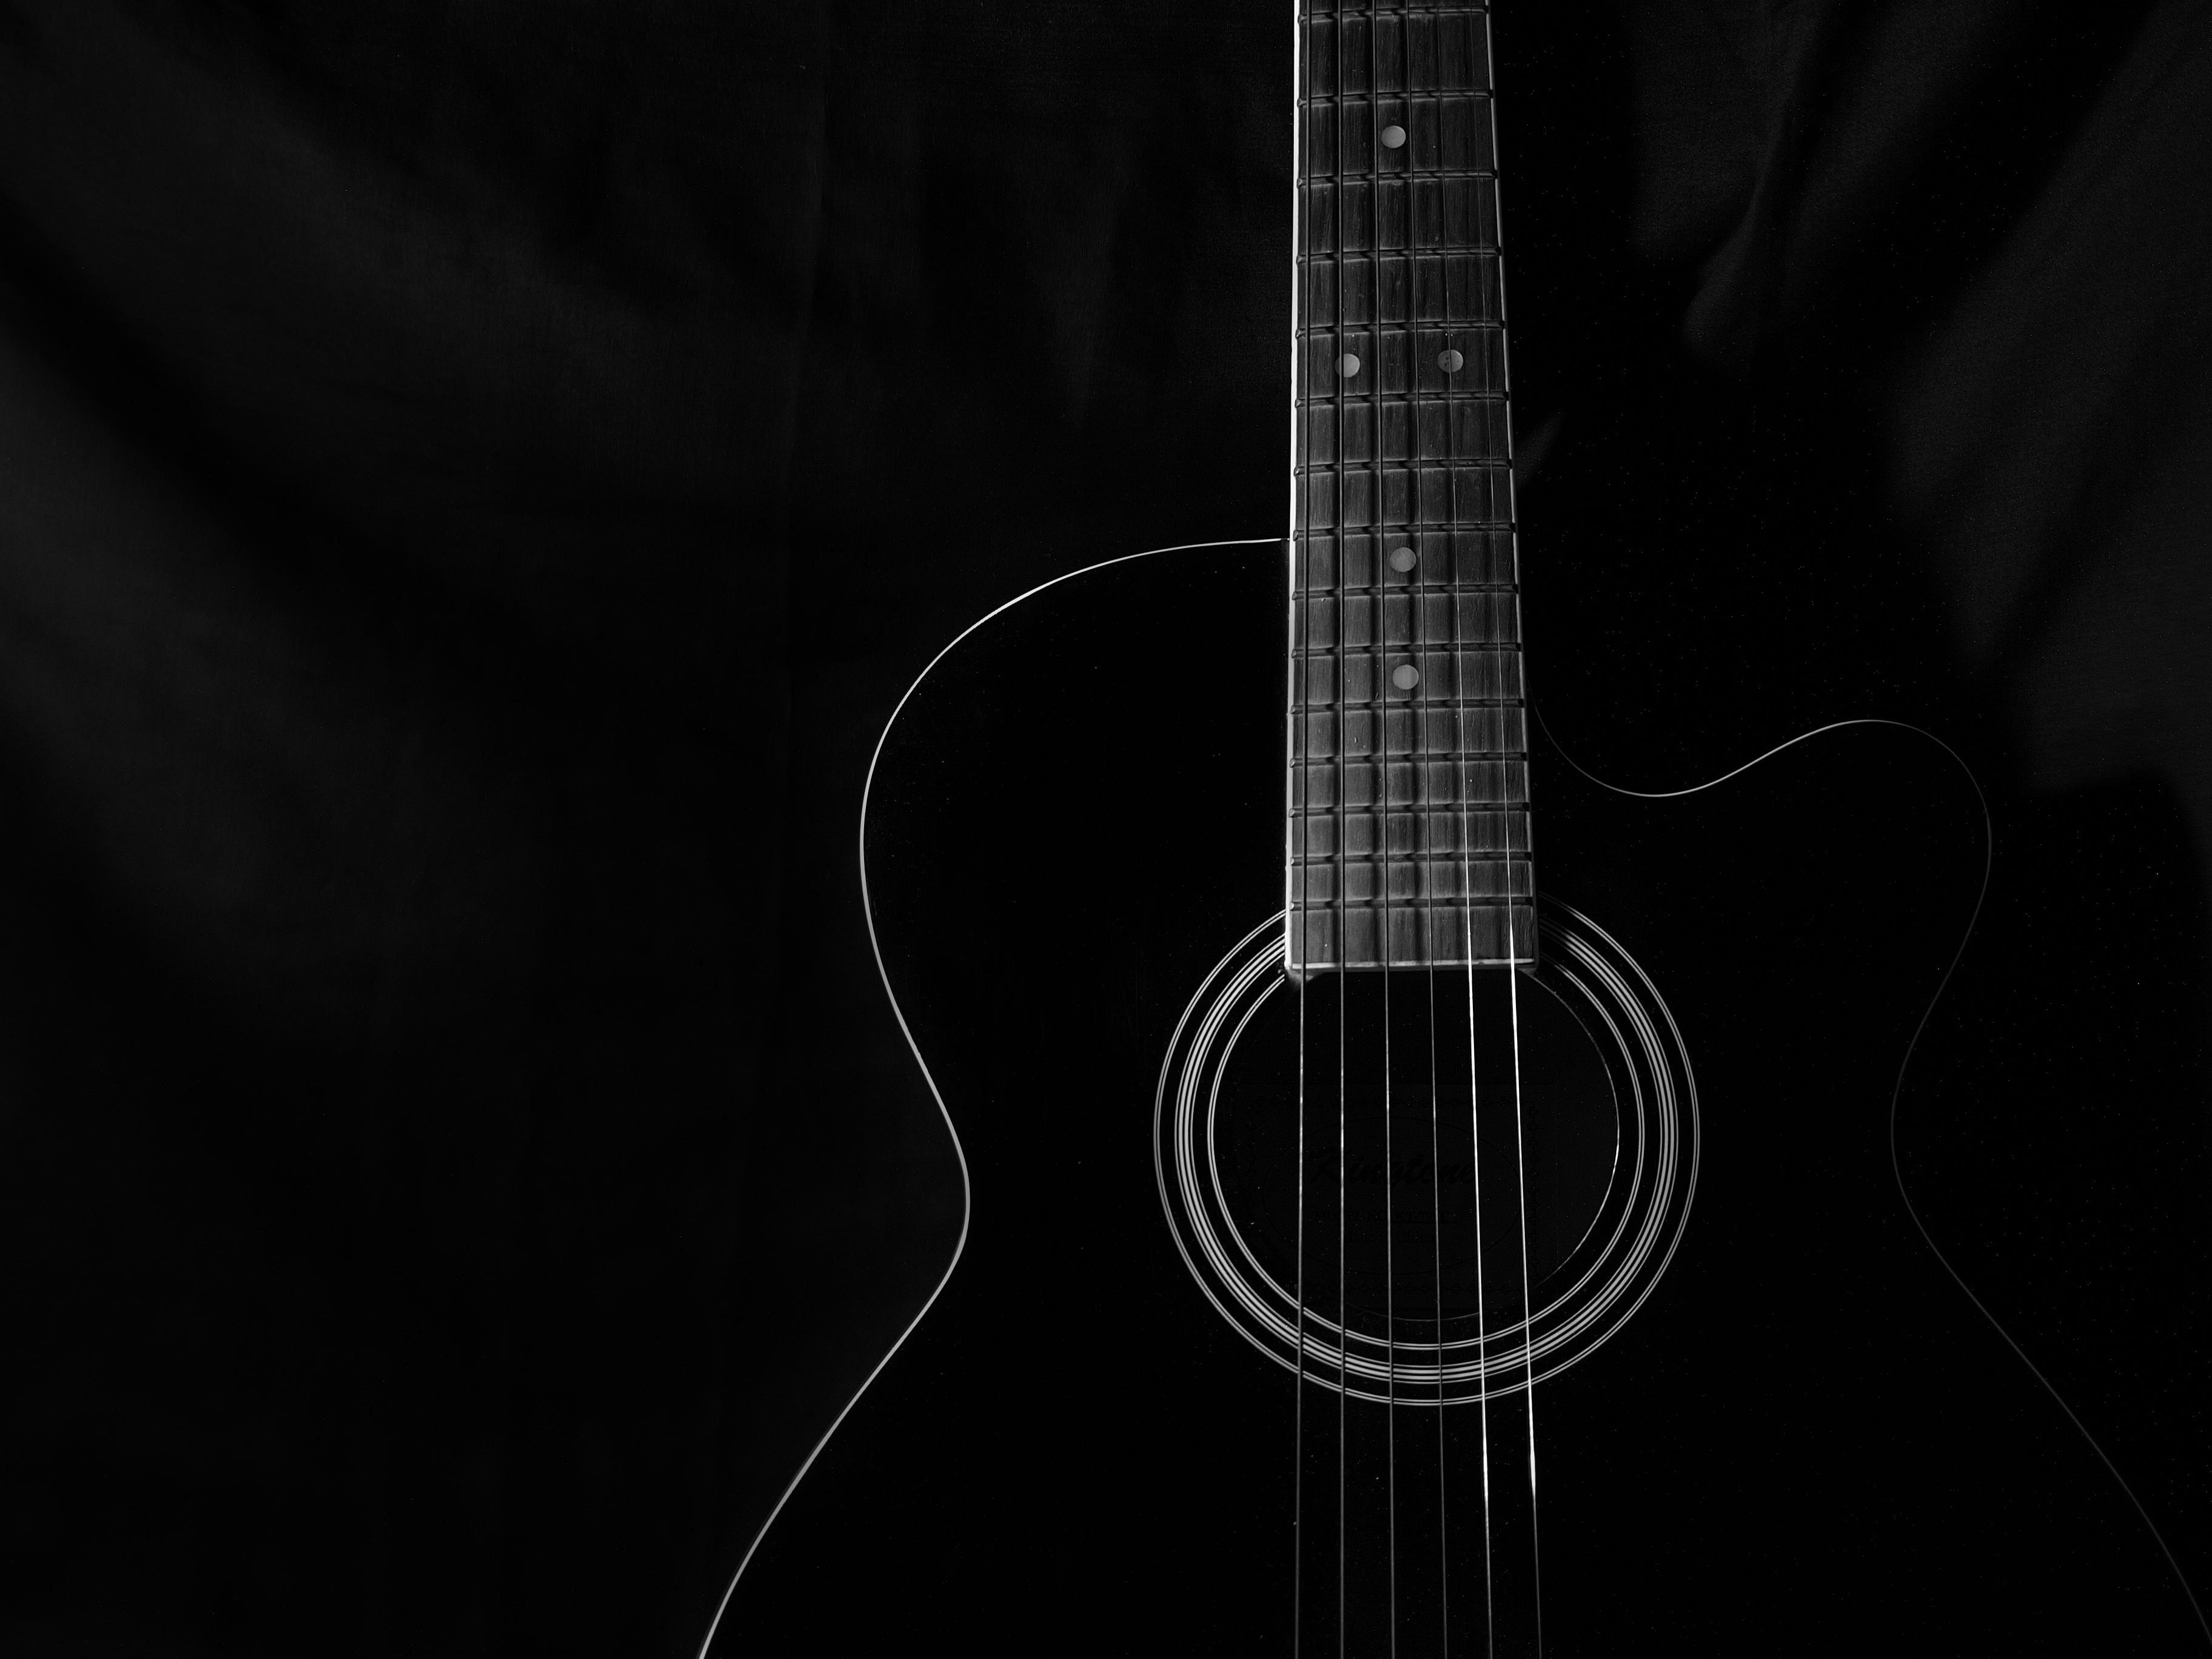 Zay S Acoustic Violao Wallpaper Wallpaper Violao